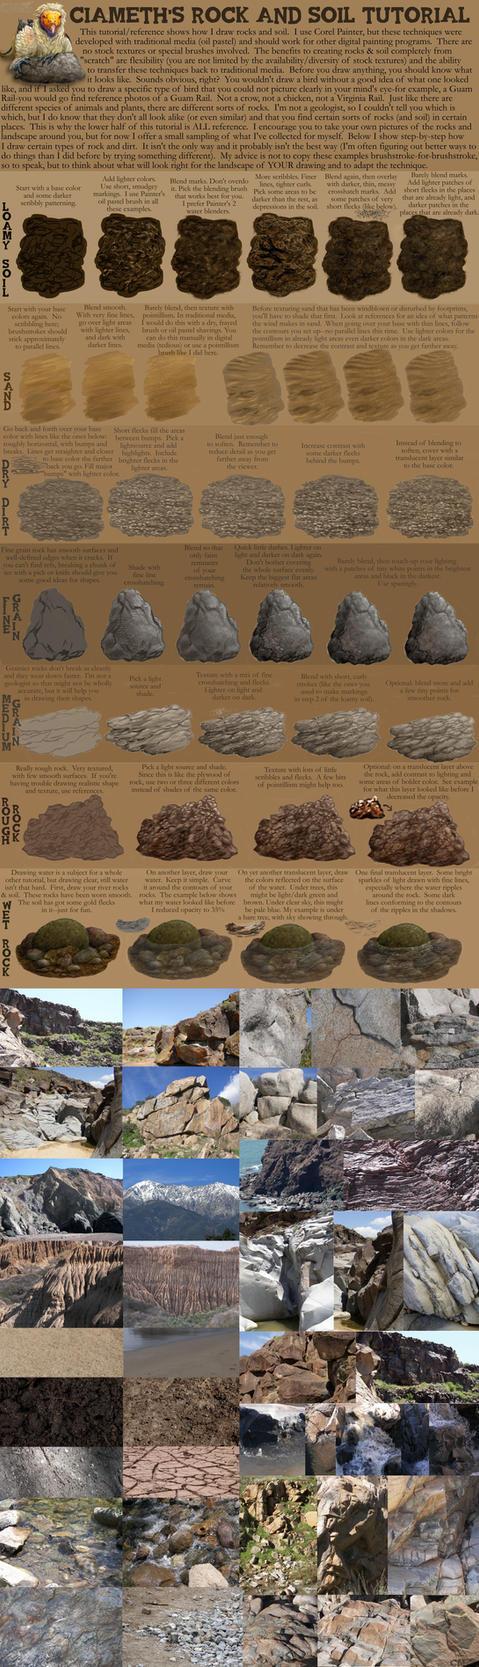 Ciameth's Rock Tutorial by Ciameth